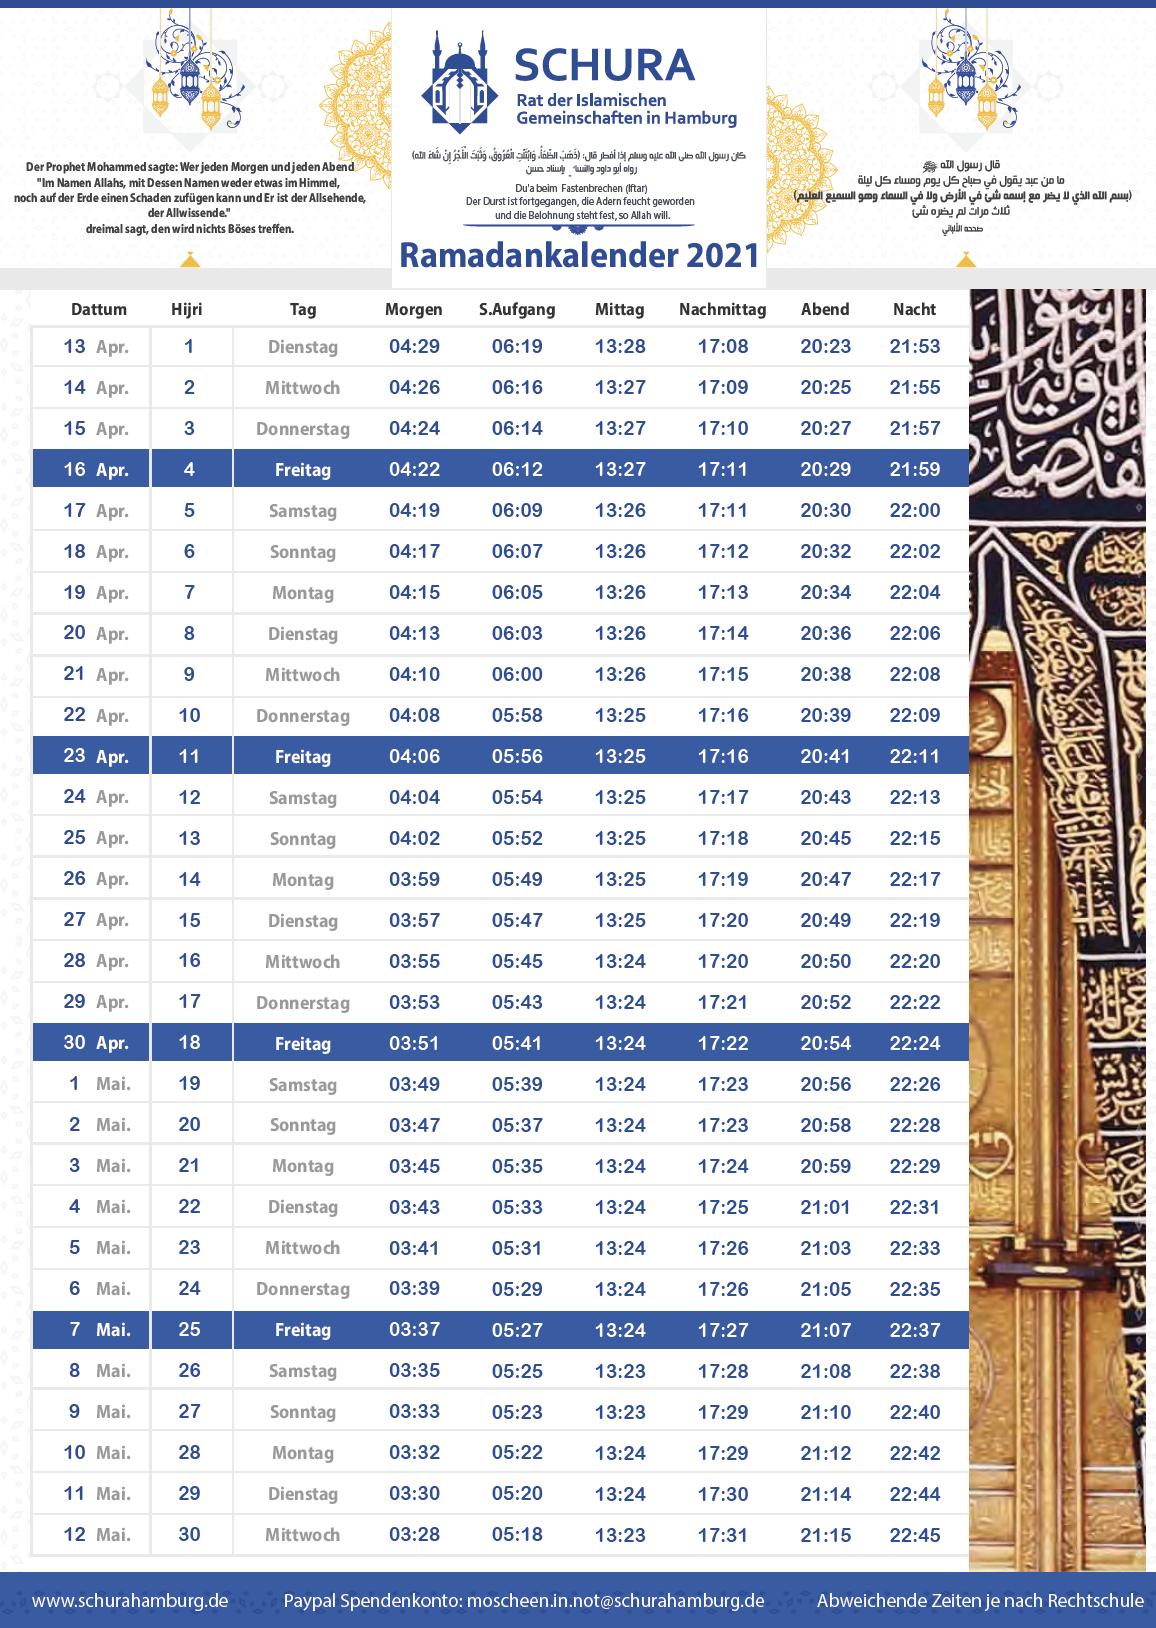 Ramadan Kalender 2021 Schura Hamburg